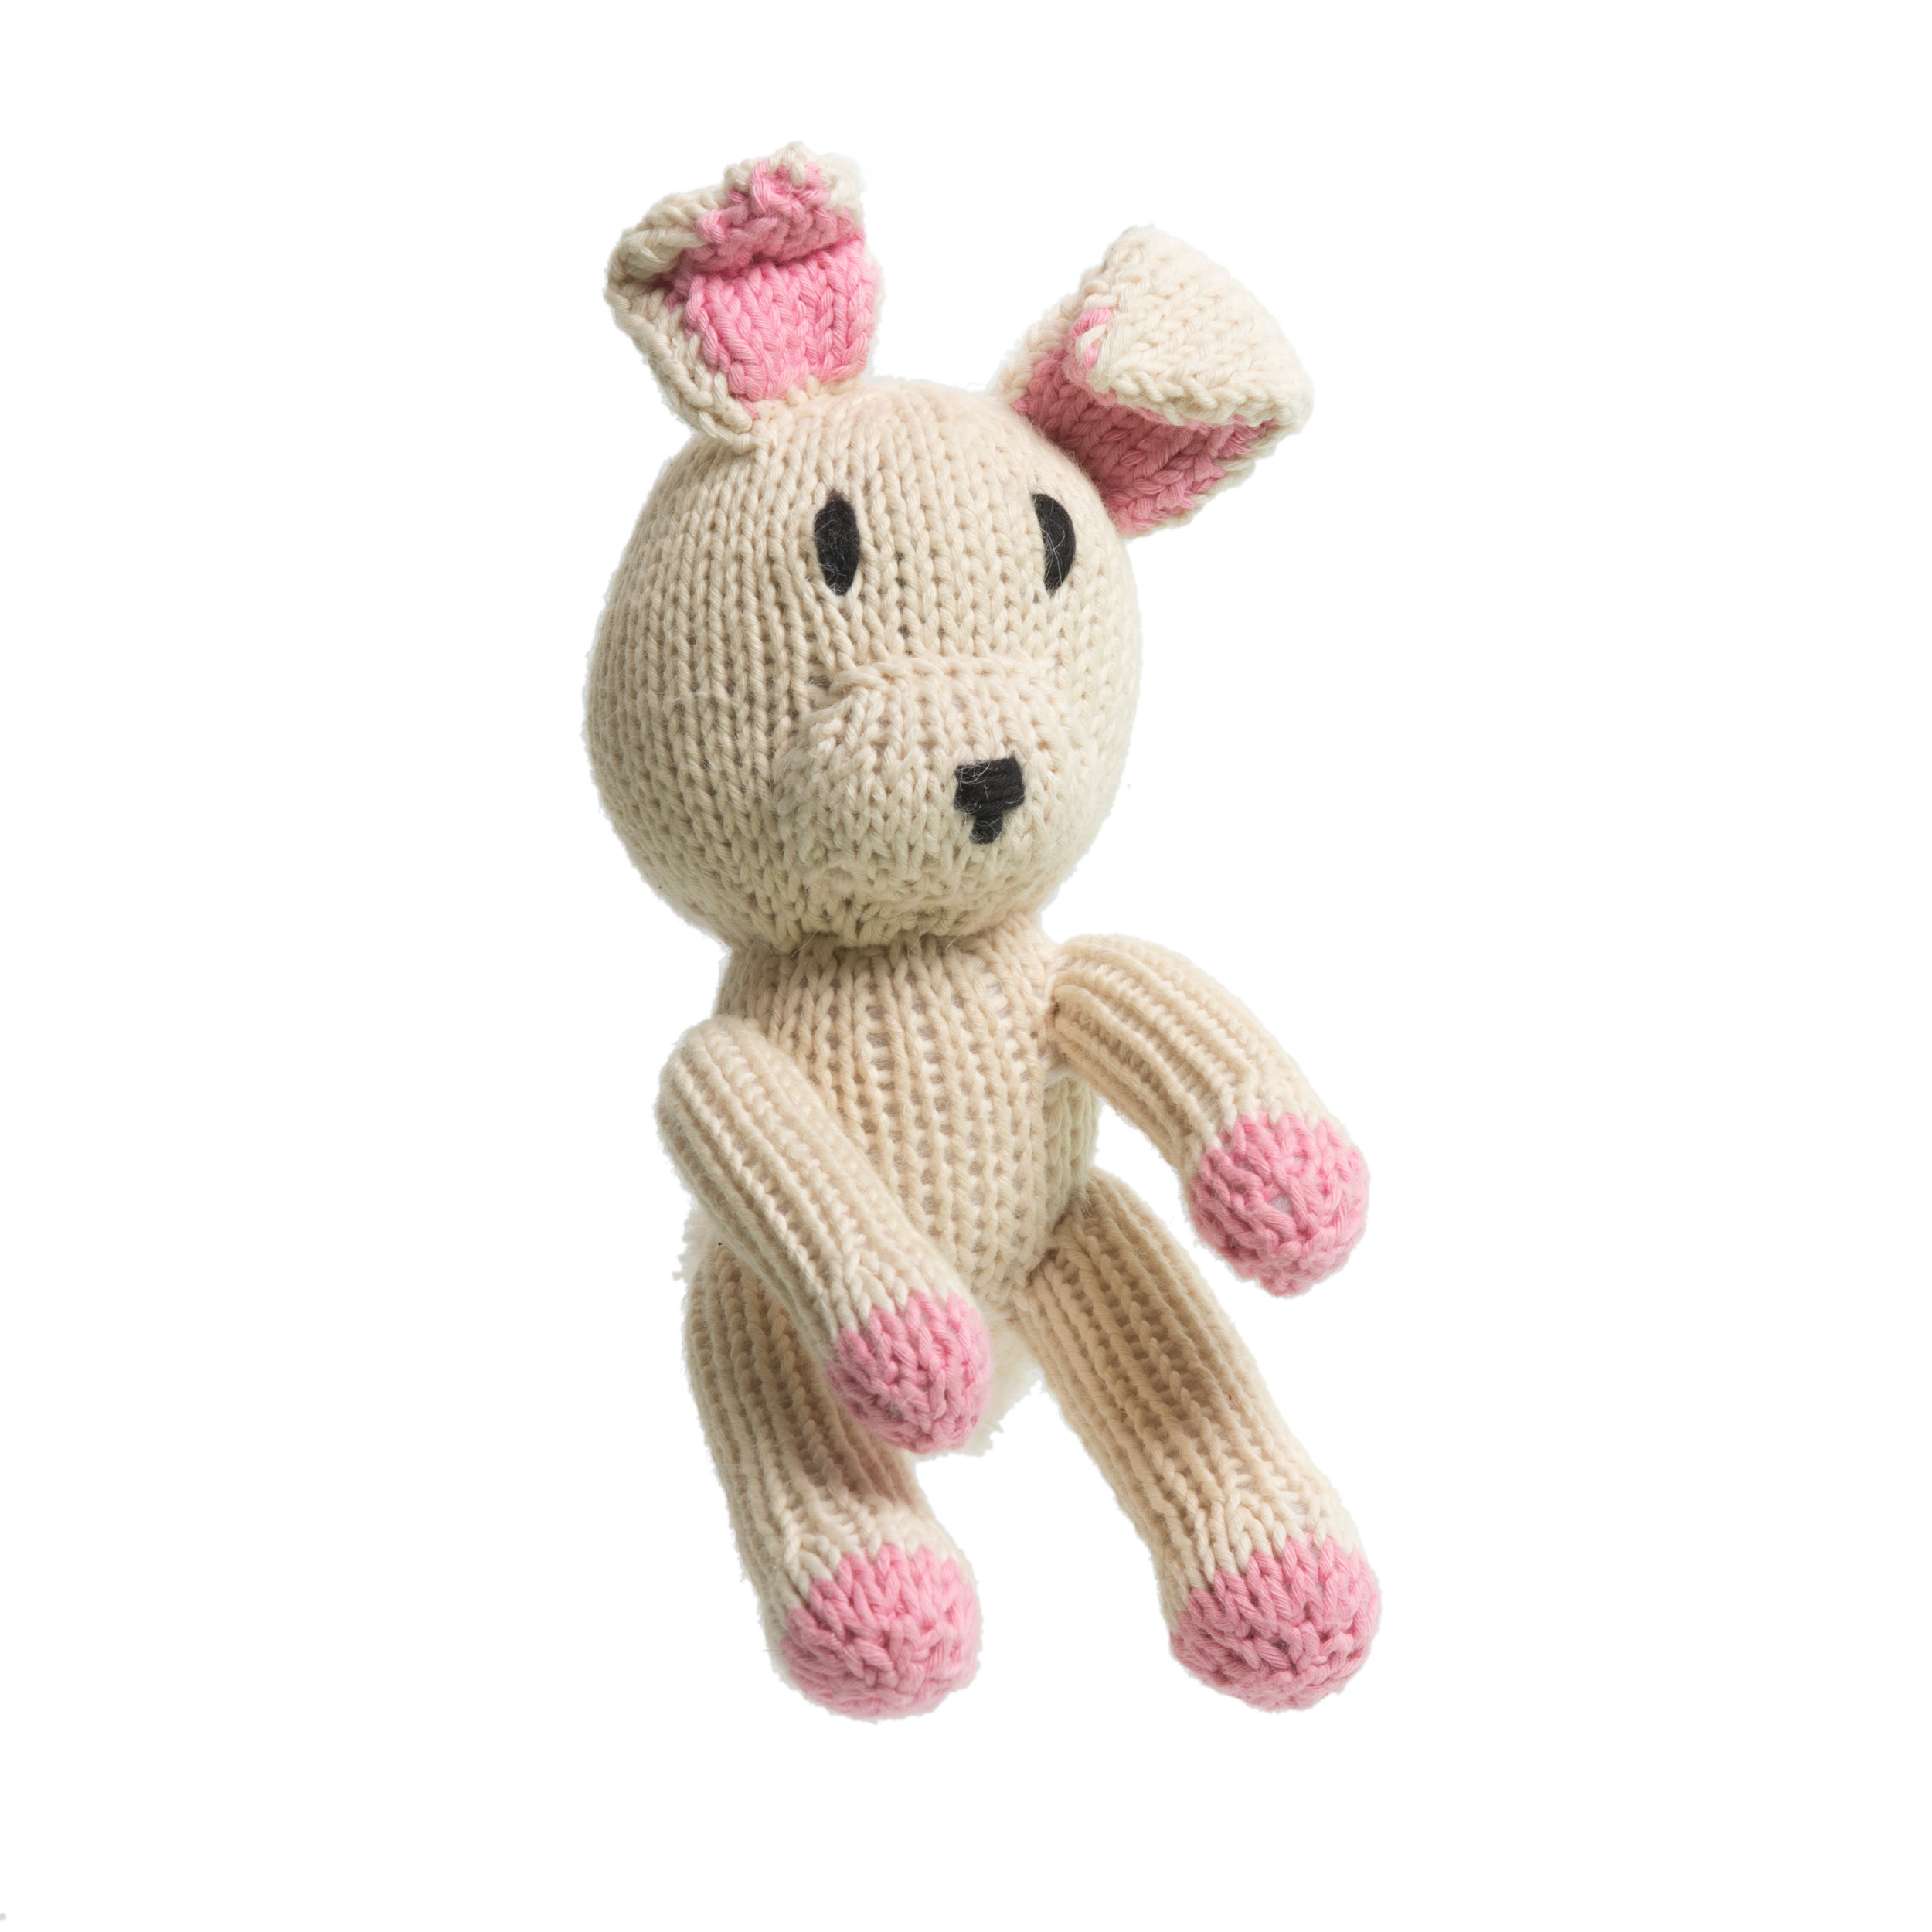 Organic Cotton Rascal Bunny - 12 cm tall